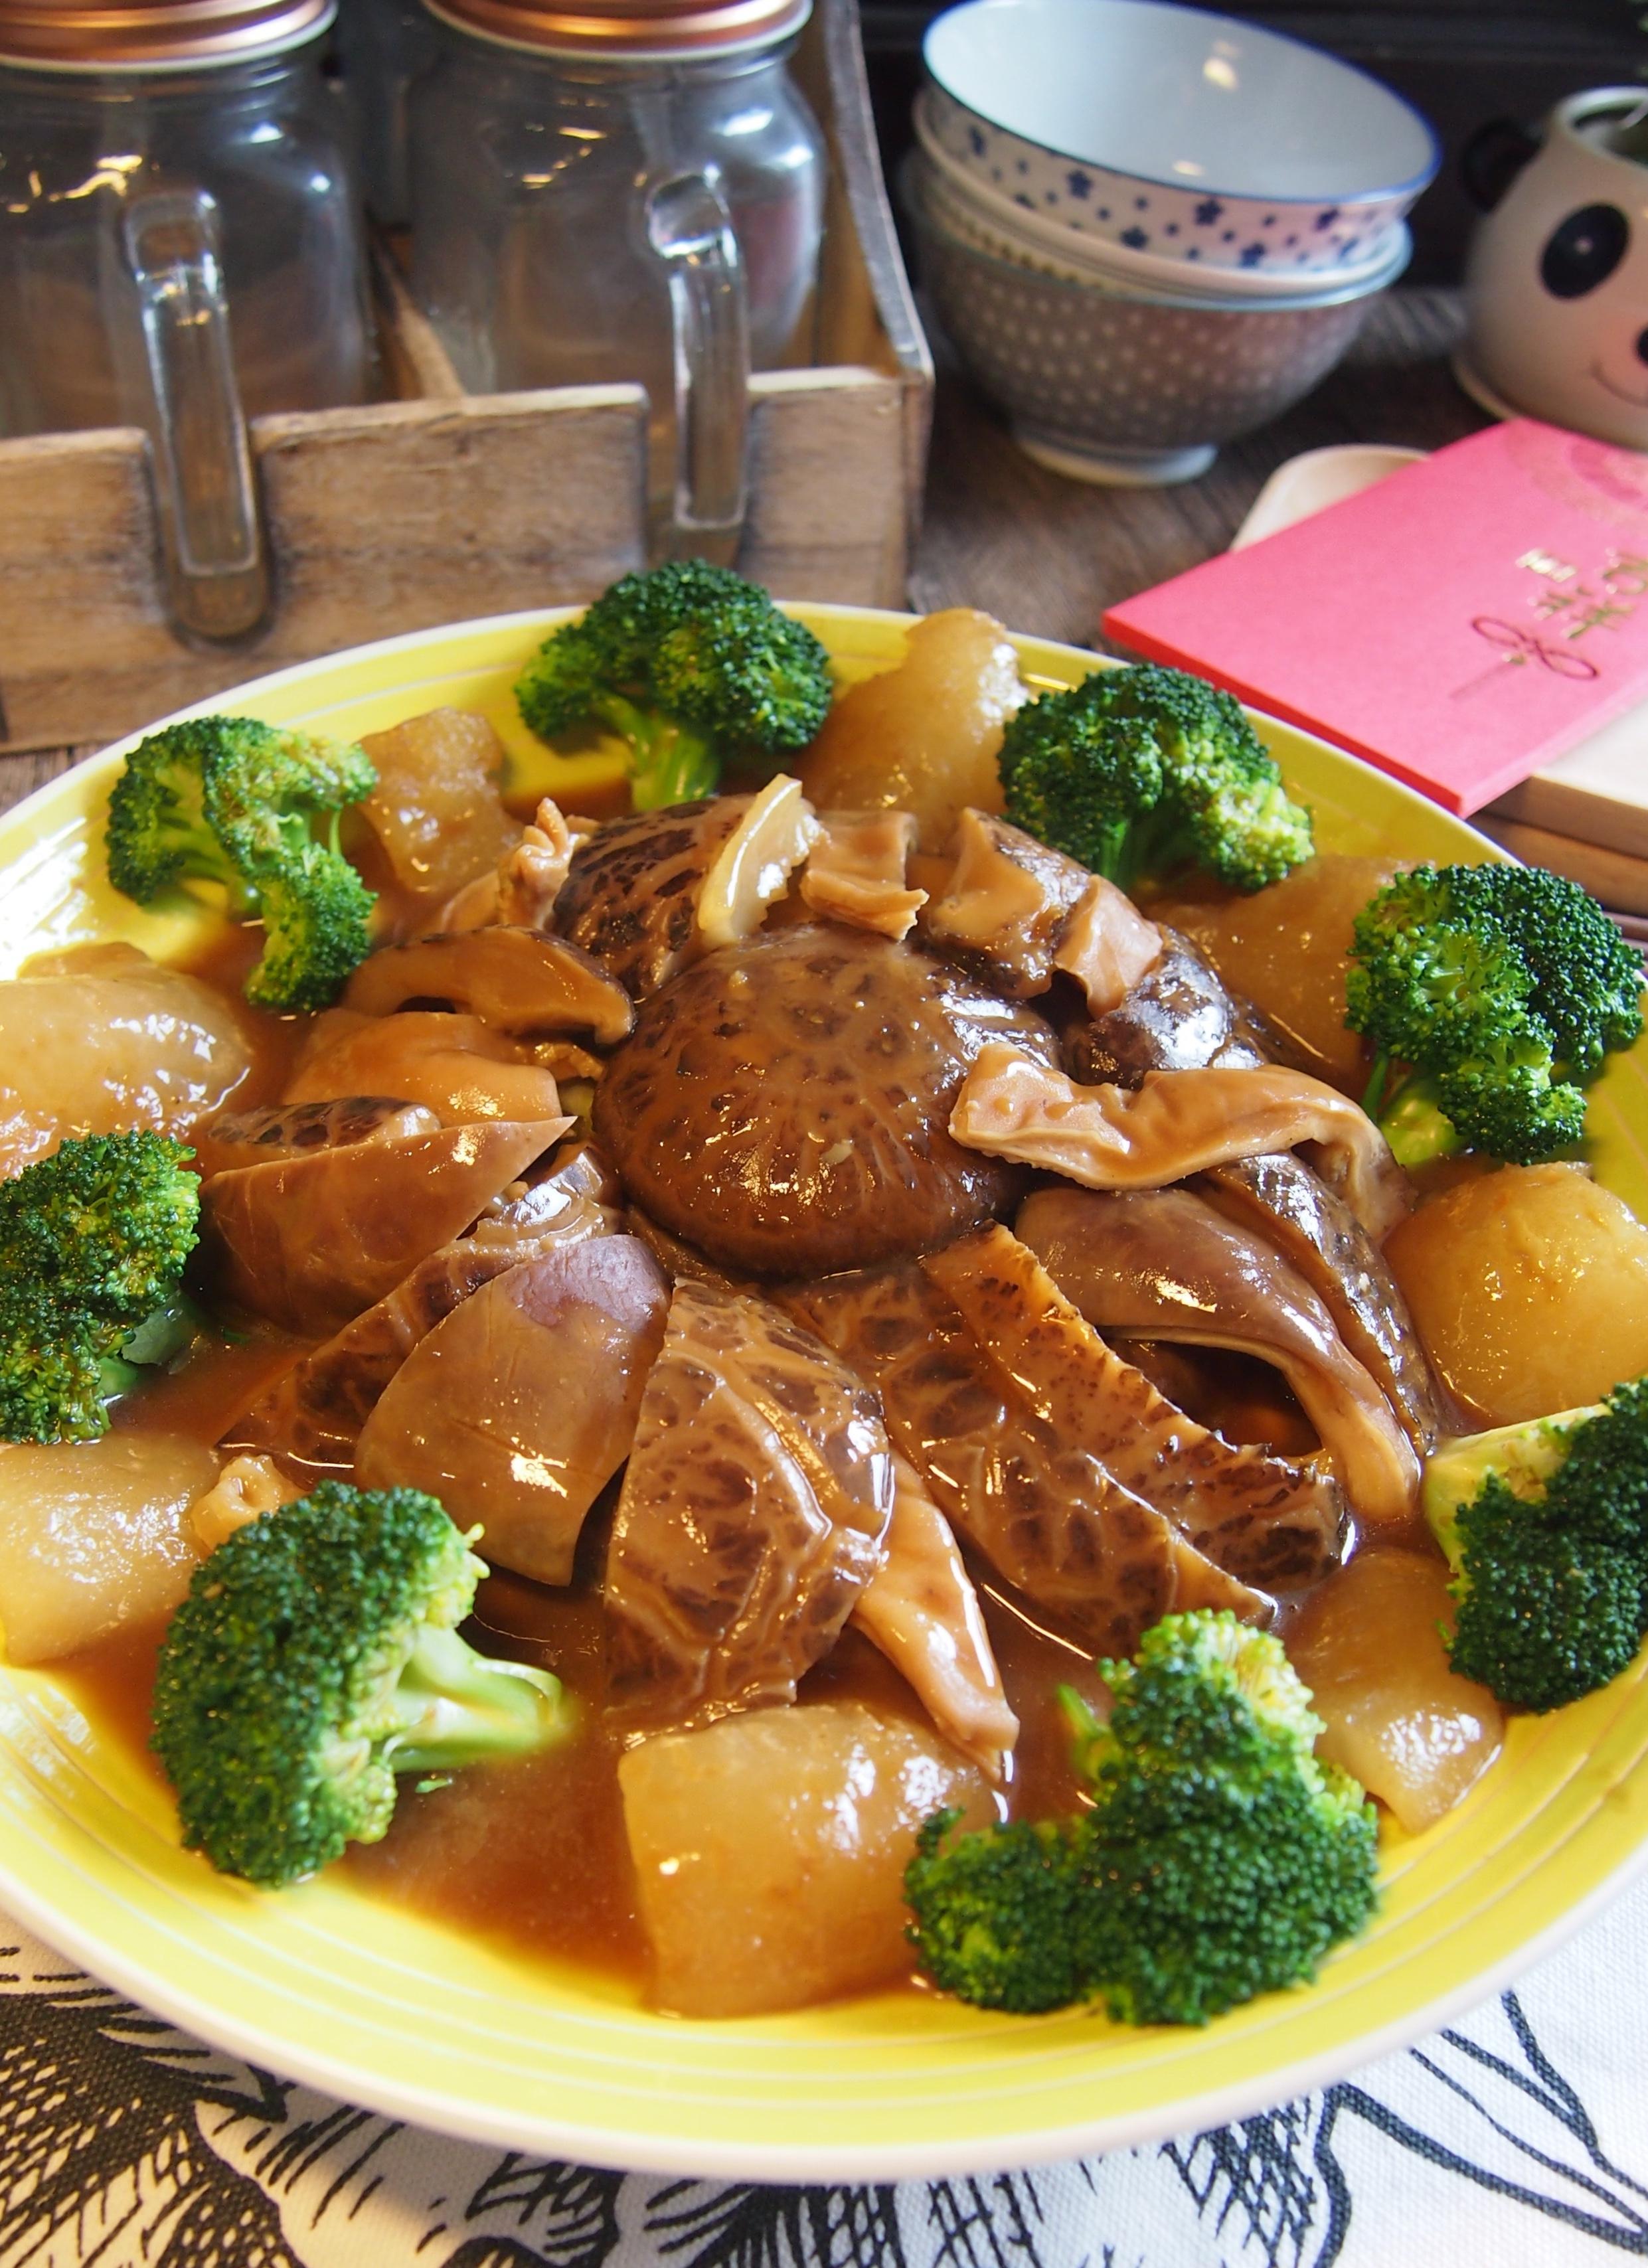 CNY Reunion Dinner Recipe: Braised Pig's Stomach w/ Mushrooms & Sea Cucumber 蘑菇海参焖猪肚